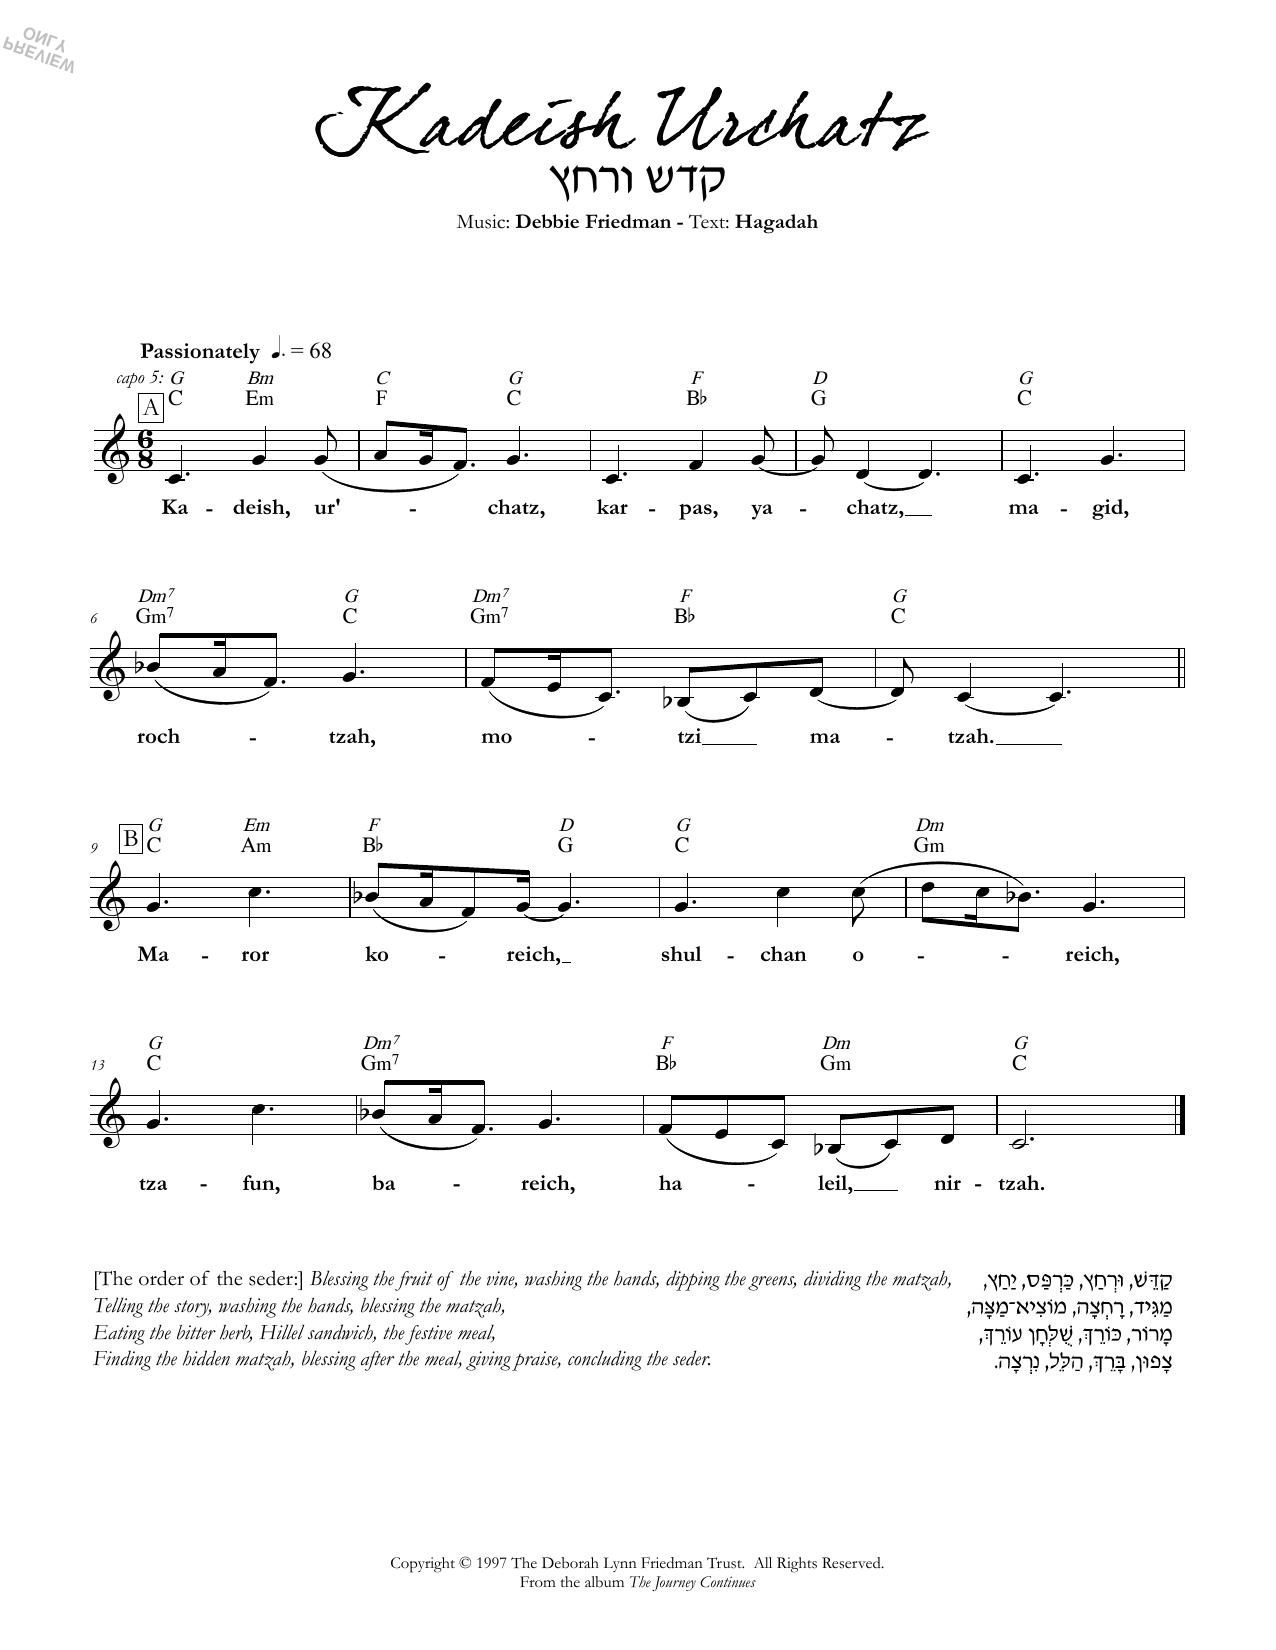 Kadeish Urchatz Sheet Music